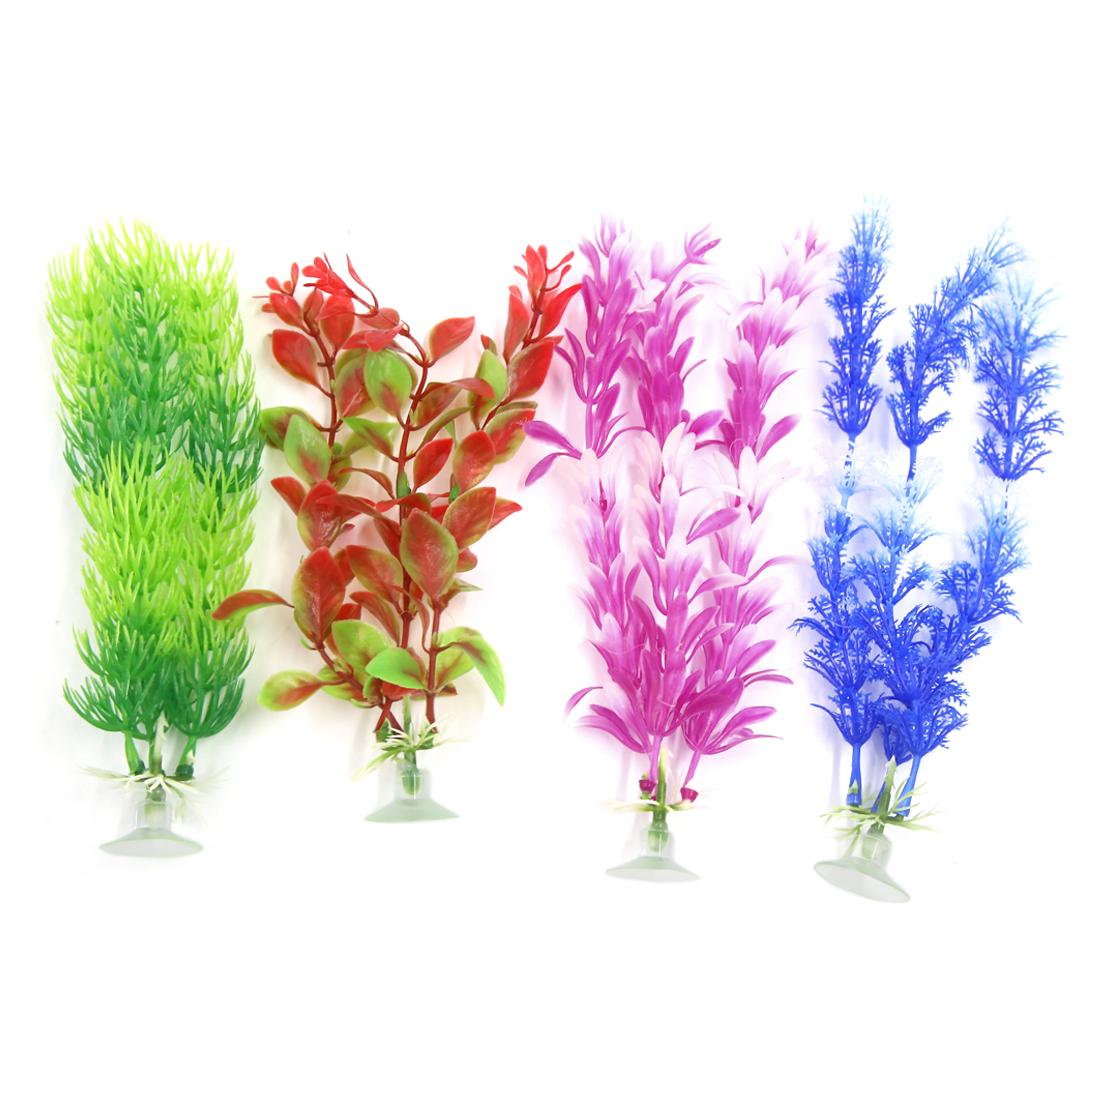 4 Pcs Aqua Ornament Deco Plastic Plants With Suction Cup For Tank